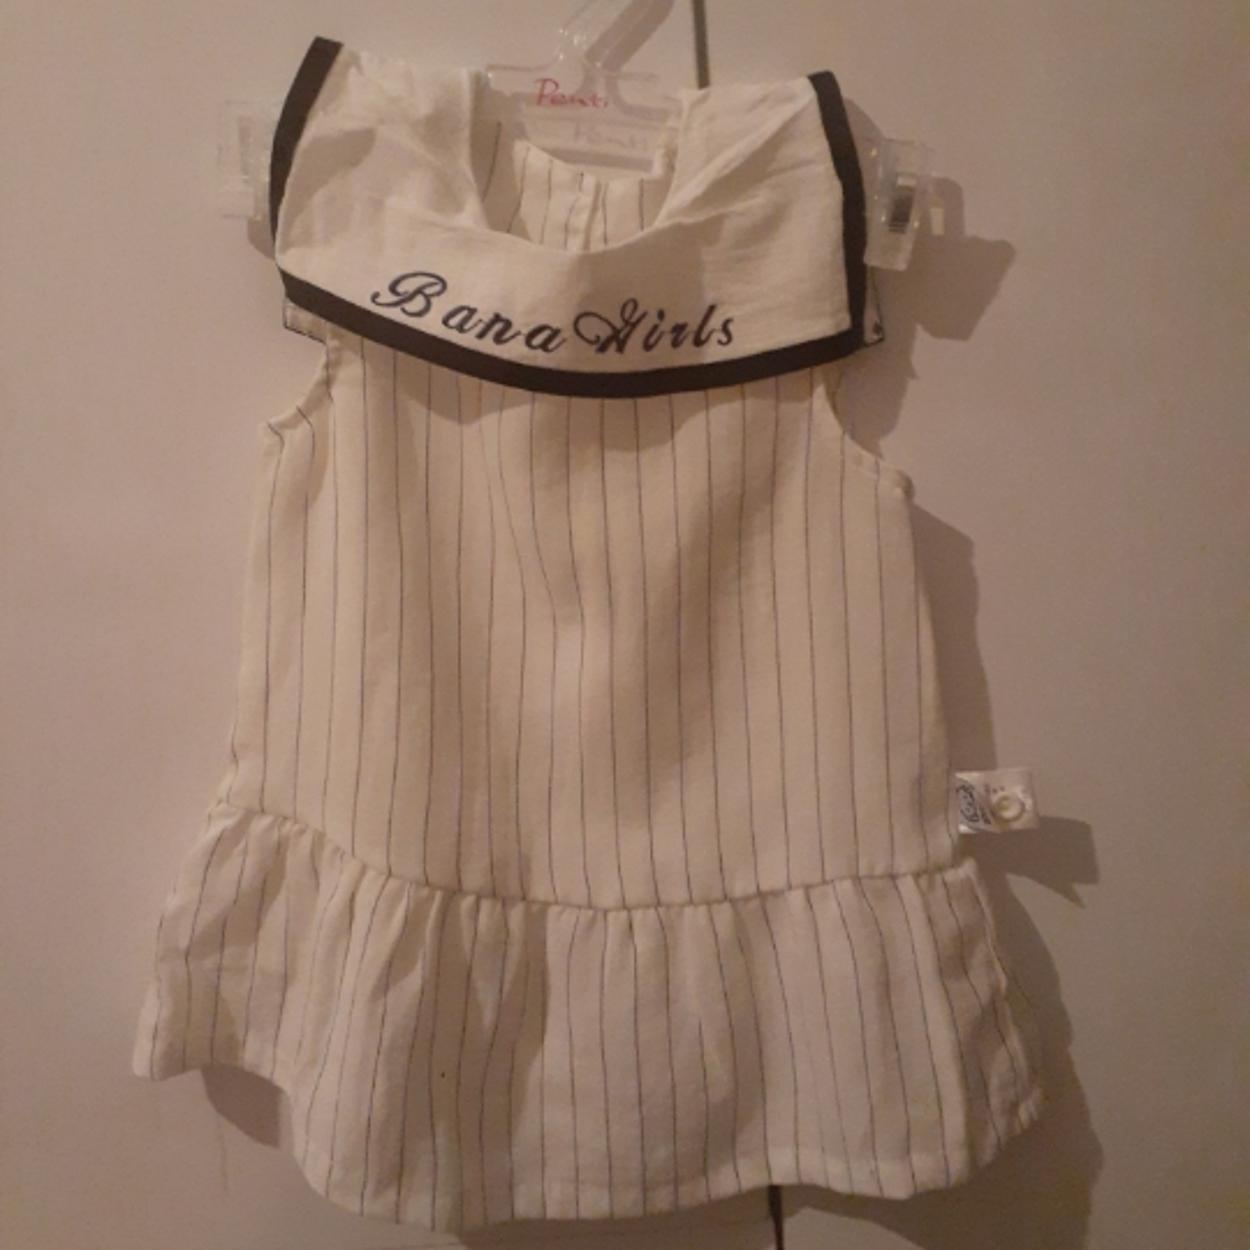 Banapati Elbise